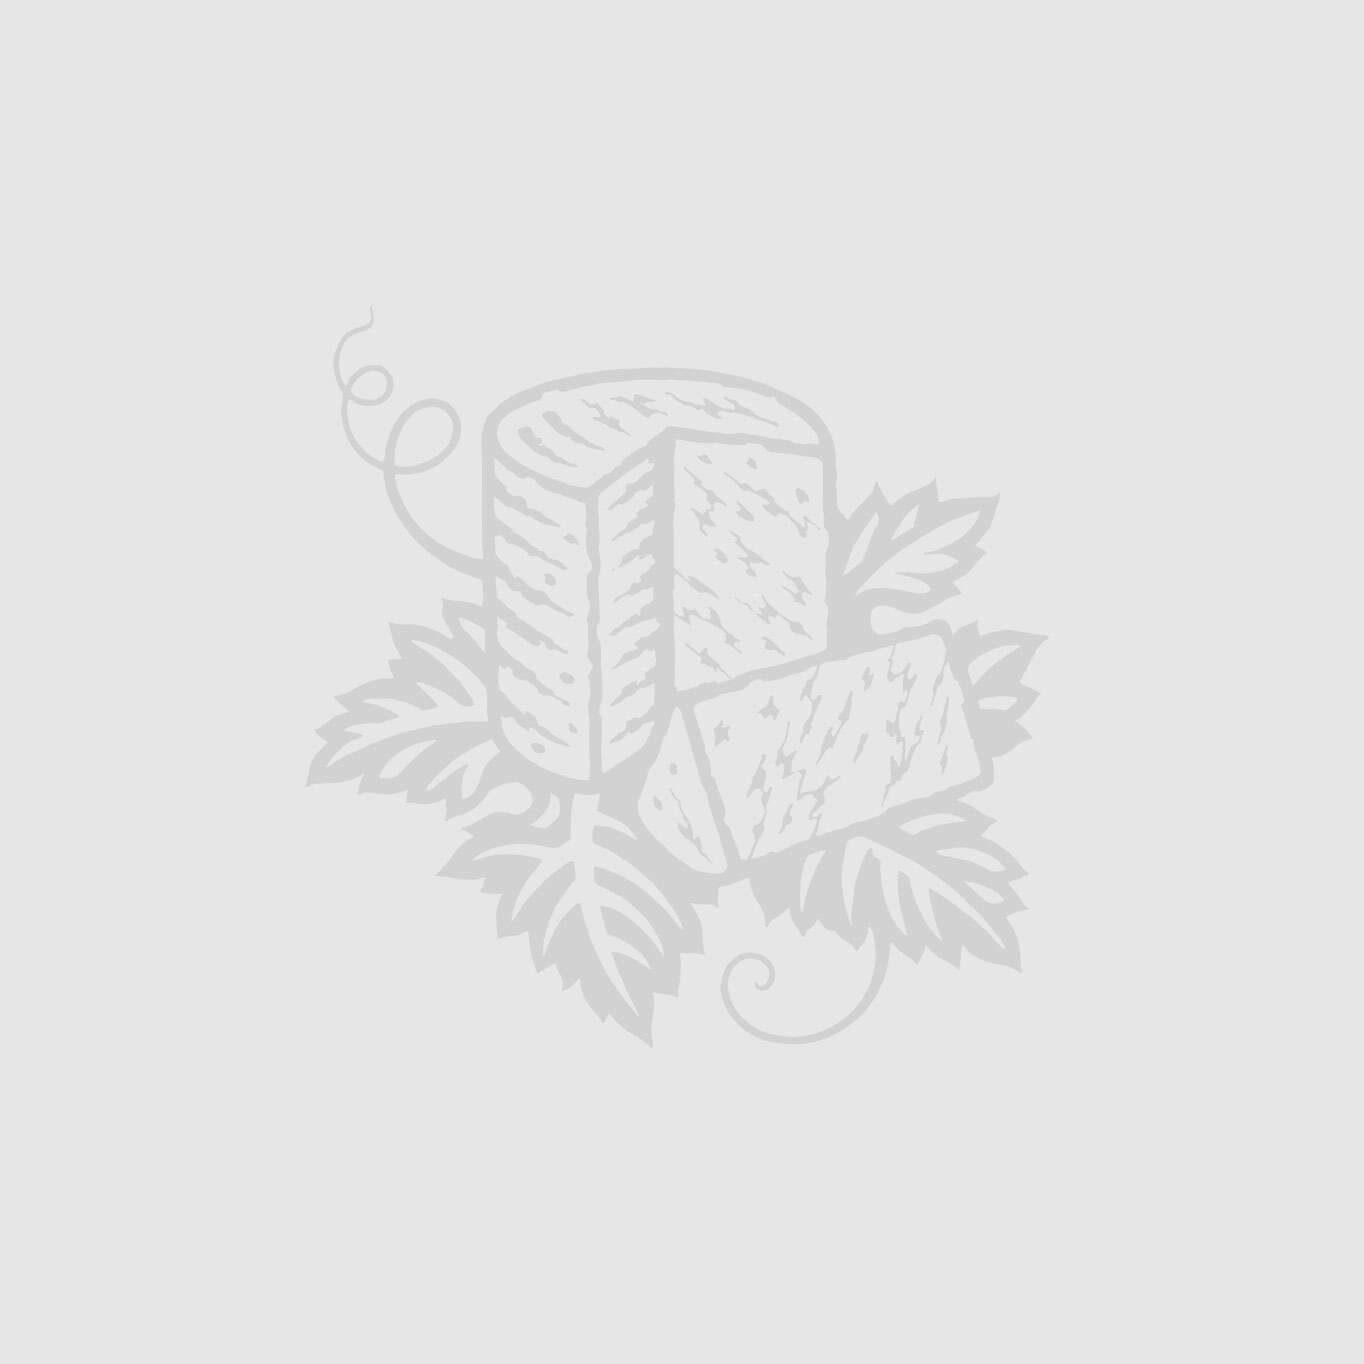 Sharpham Rustic - Wild Garlic & Chives